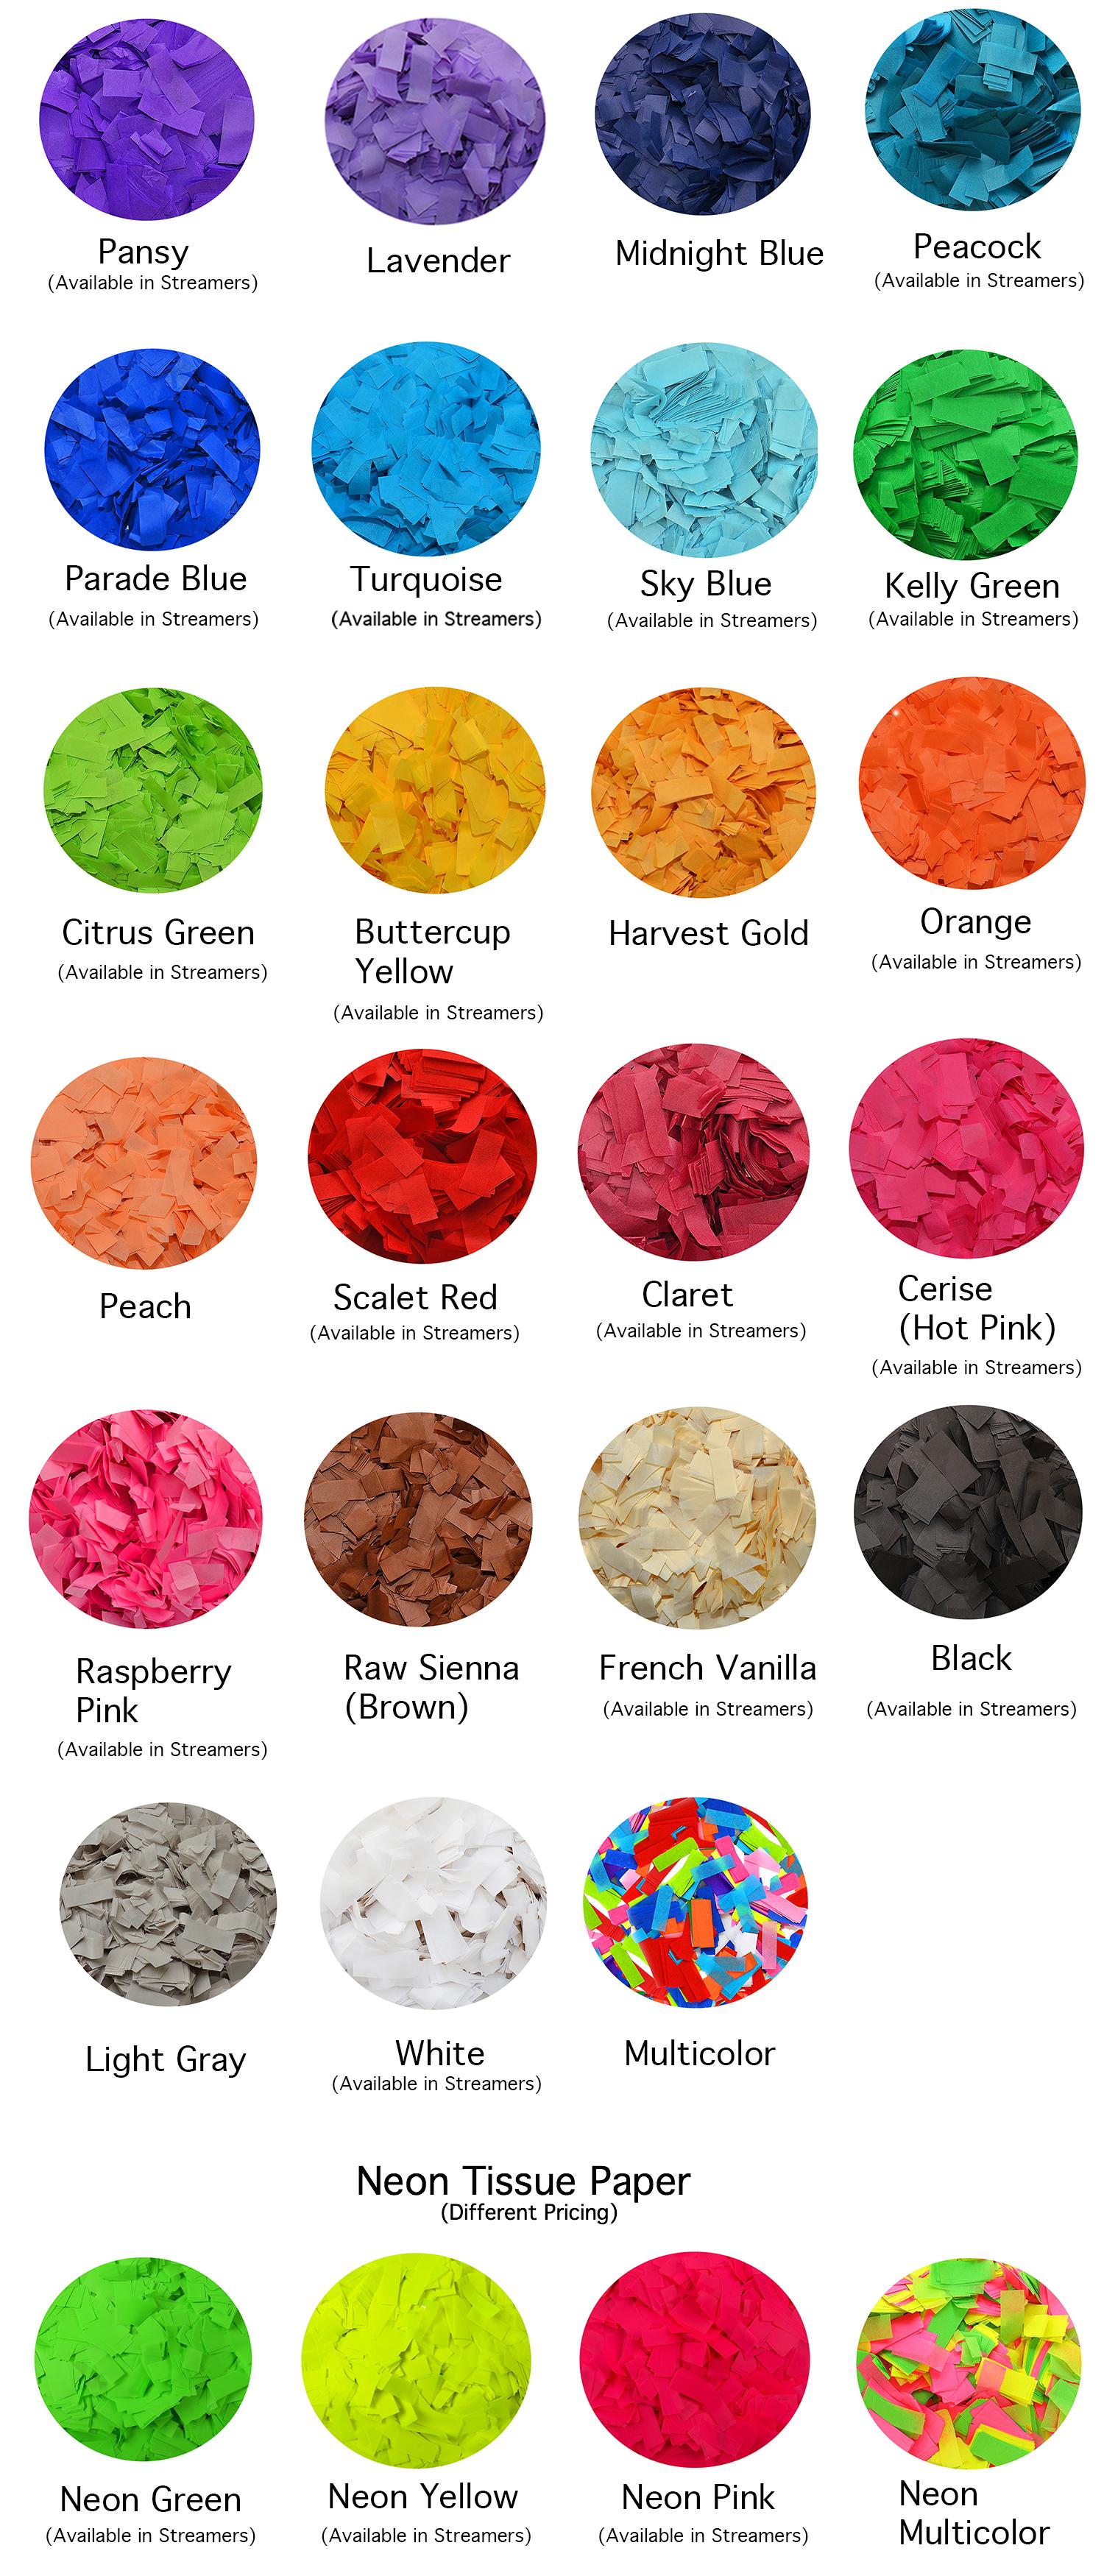 tissue-color-circle-august4.jpg